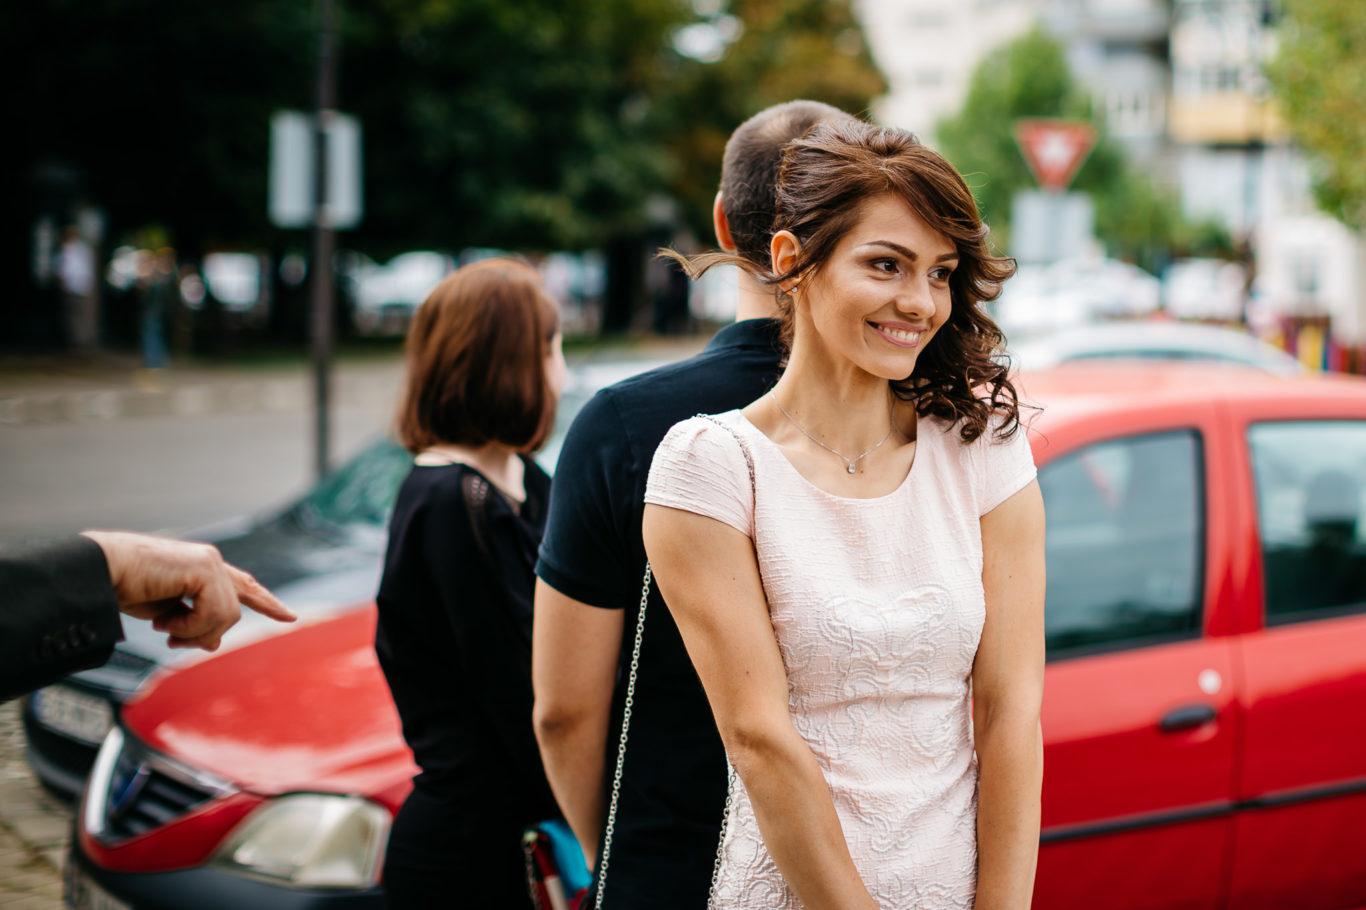 0005-fotografie-nunta-bucuresti-dana-radu-fotograf-ciprian-dumitrescu-cd2_5986